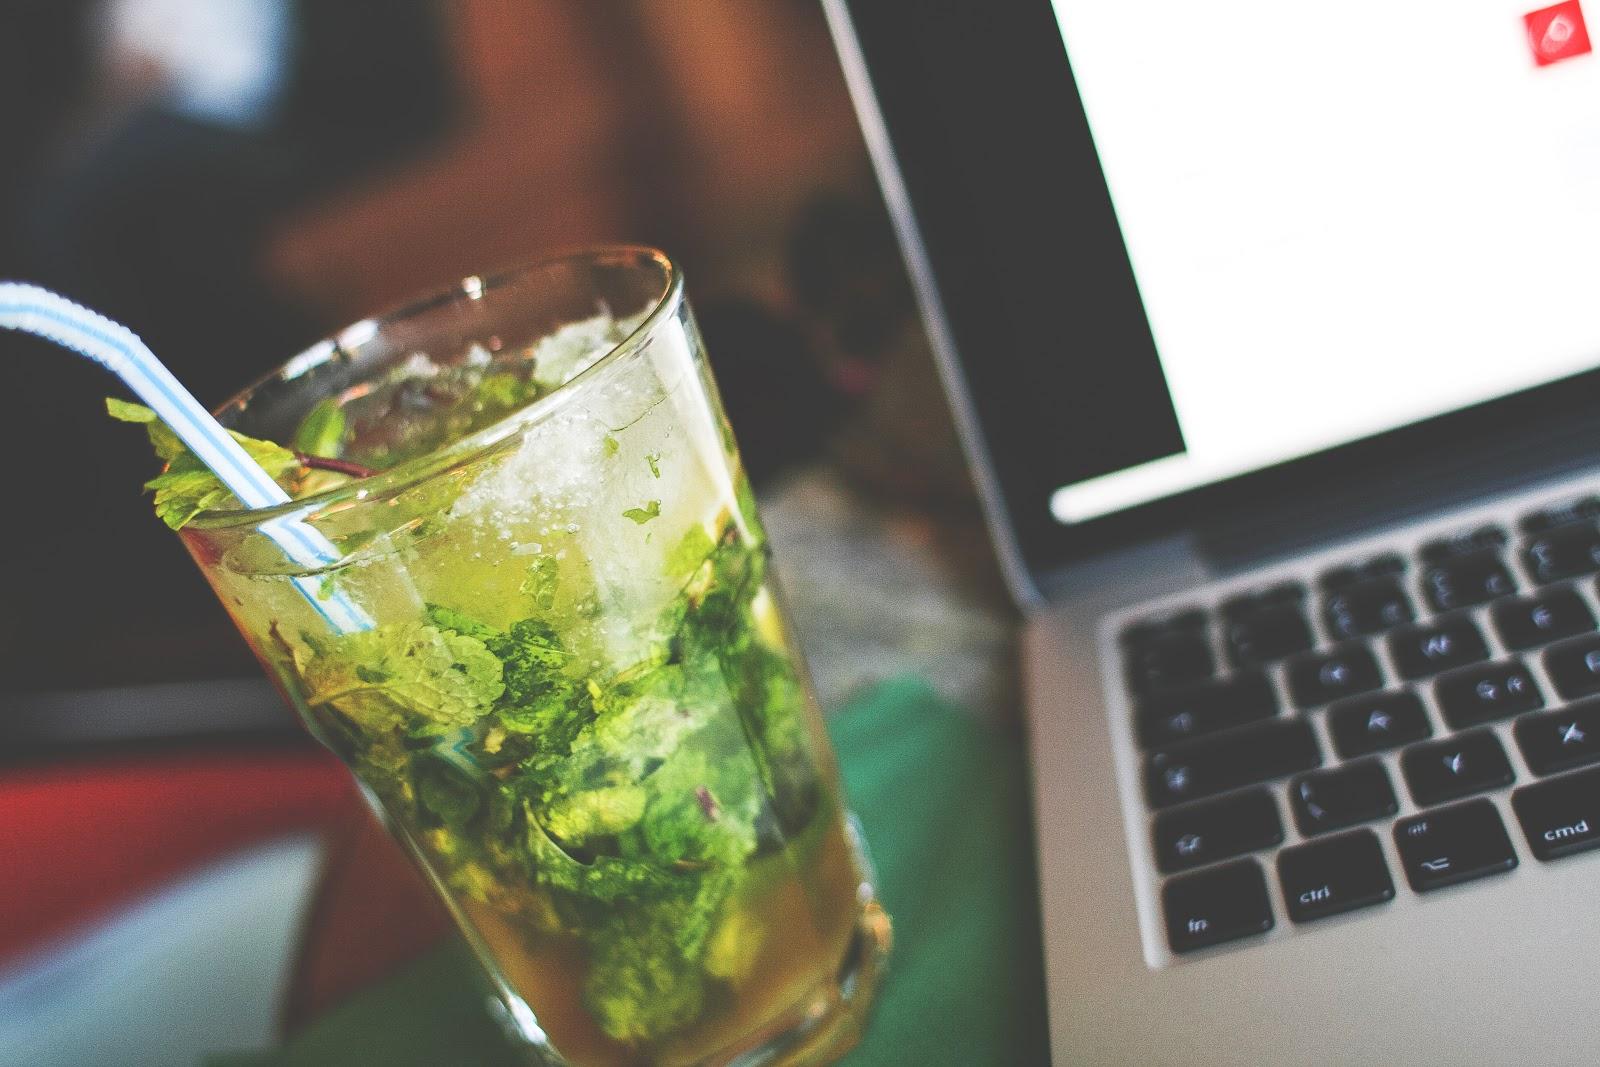 mojito-with-a-laptop-picjumbo-com.jpg